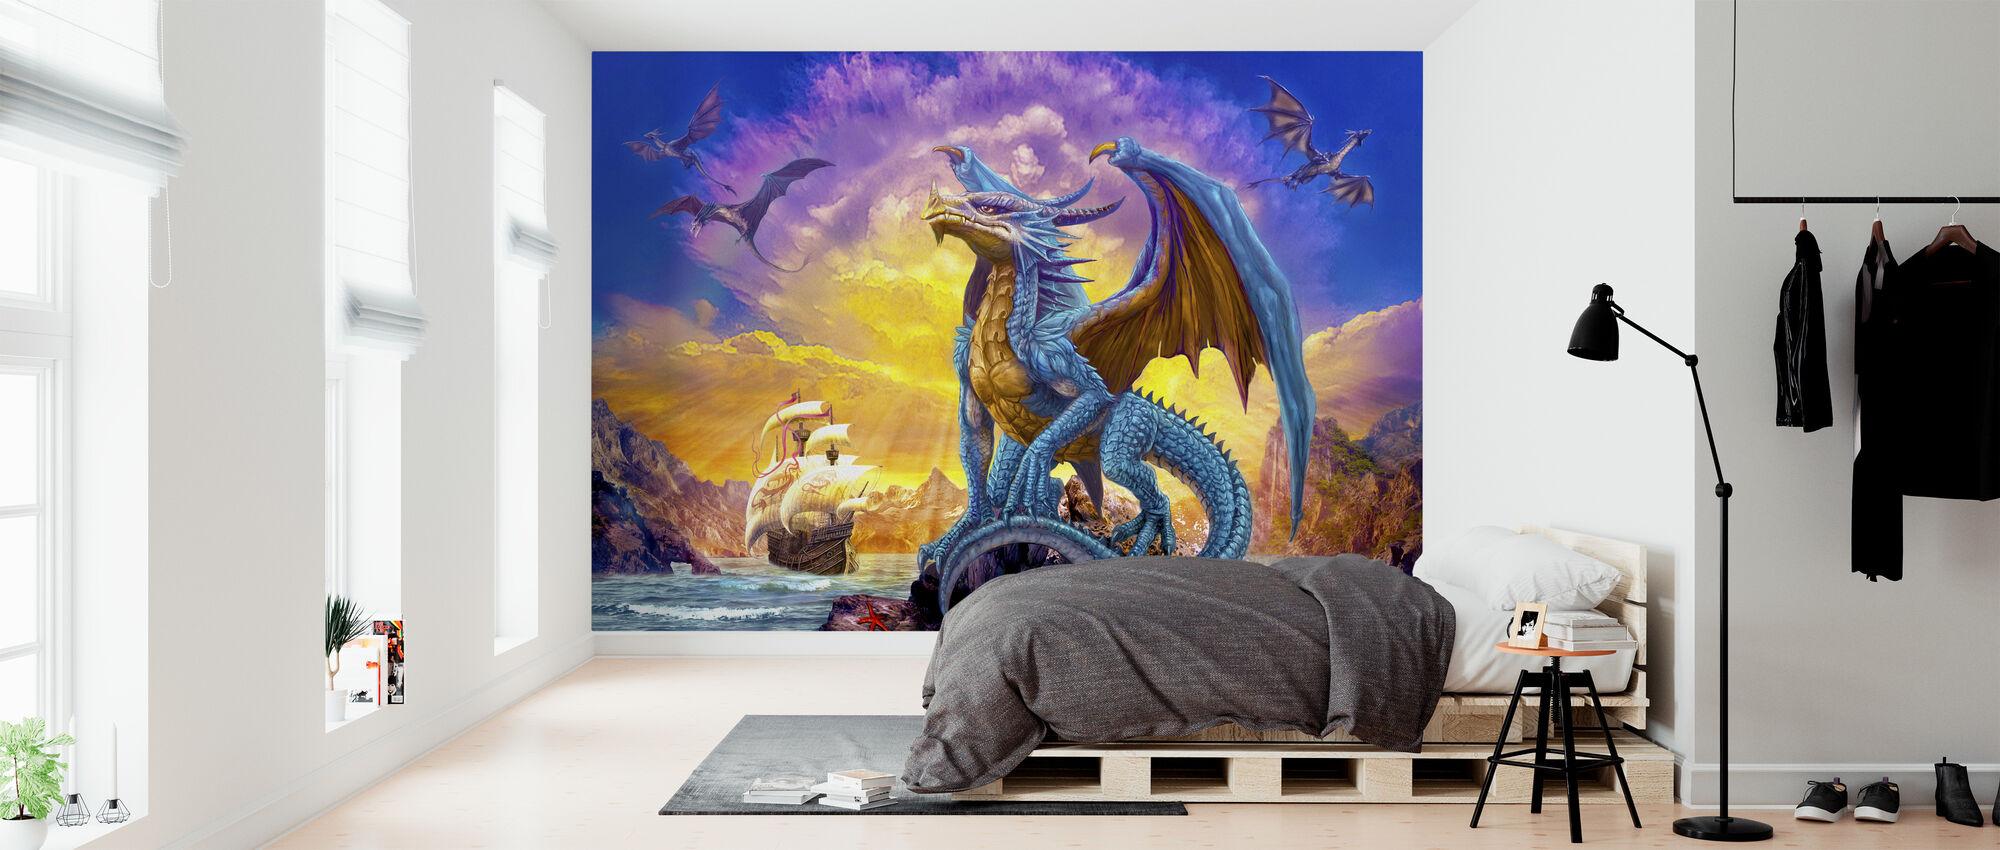 Dragons and Ship - Wallpaper - Bedroom